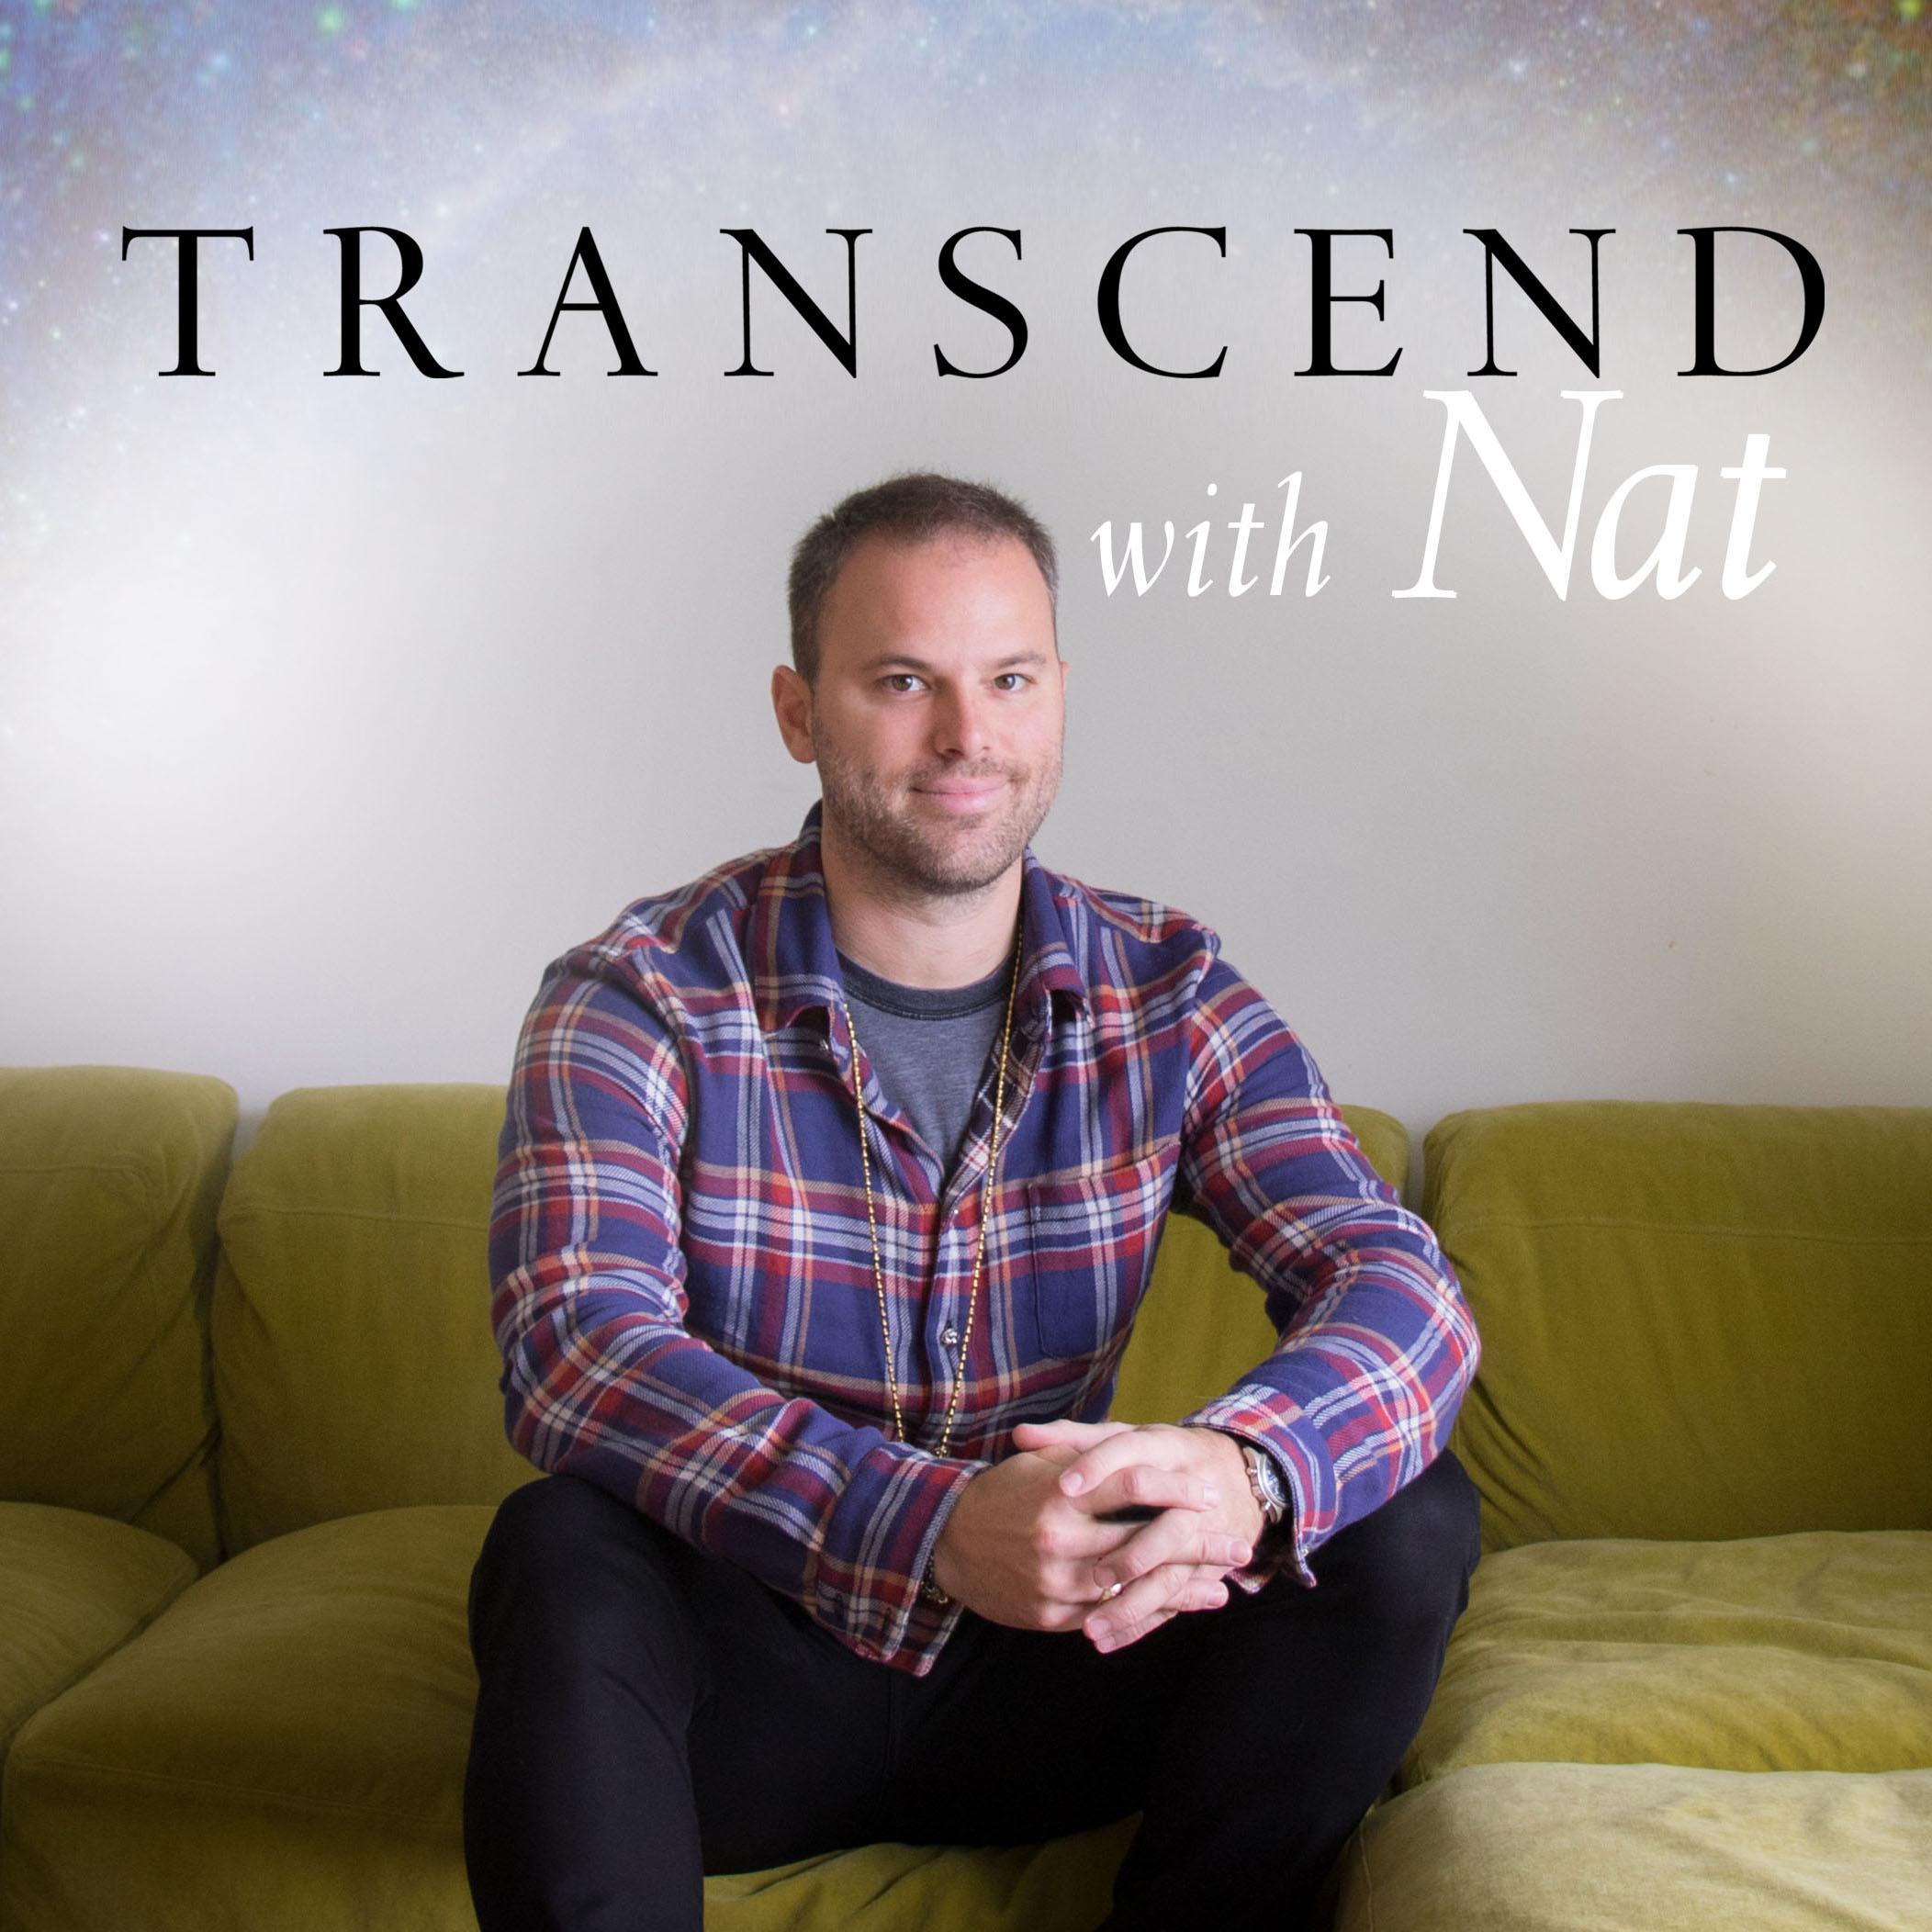 Transcend with Nat show art